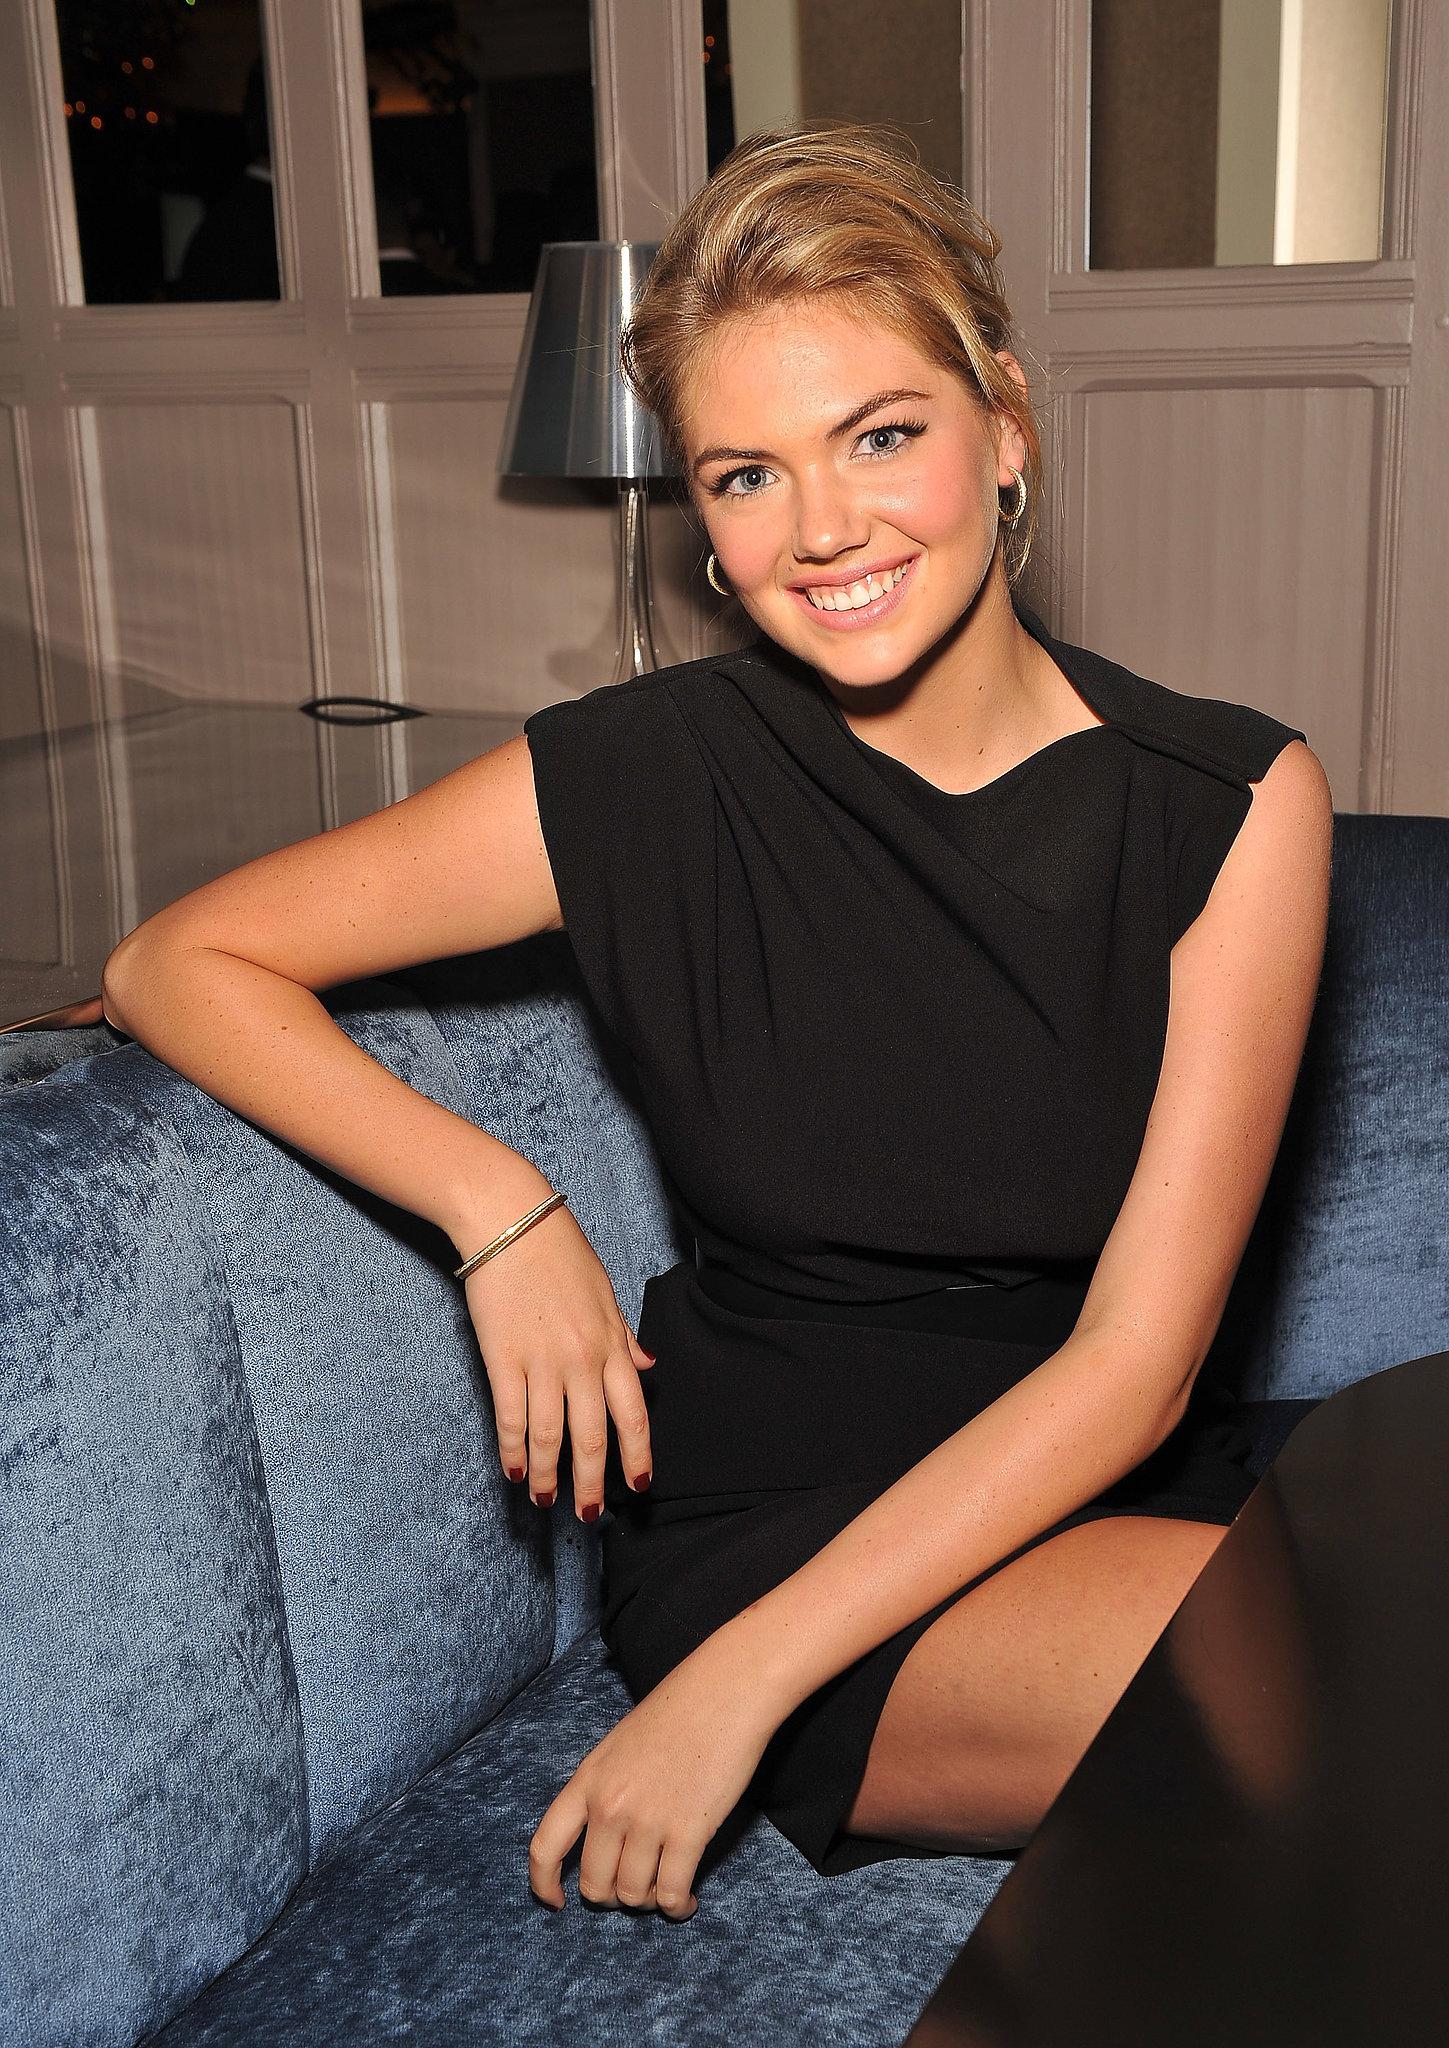 Kate Upton at Daily Front Row's Fashion Media Awards.